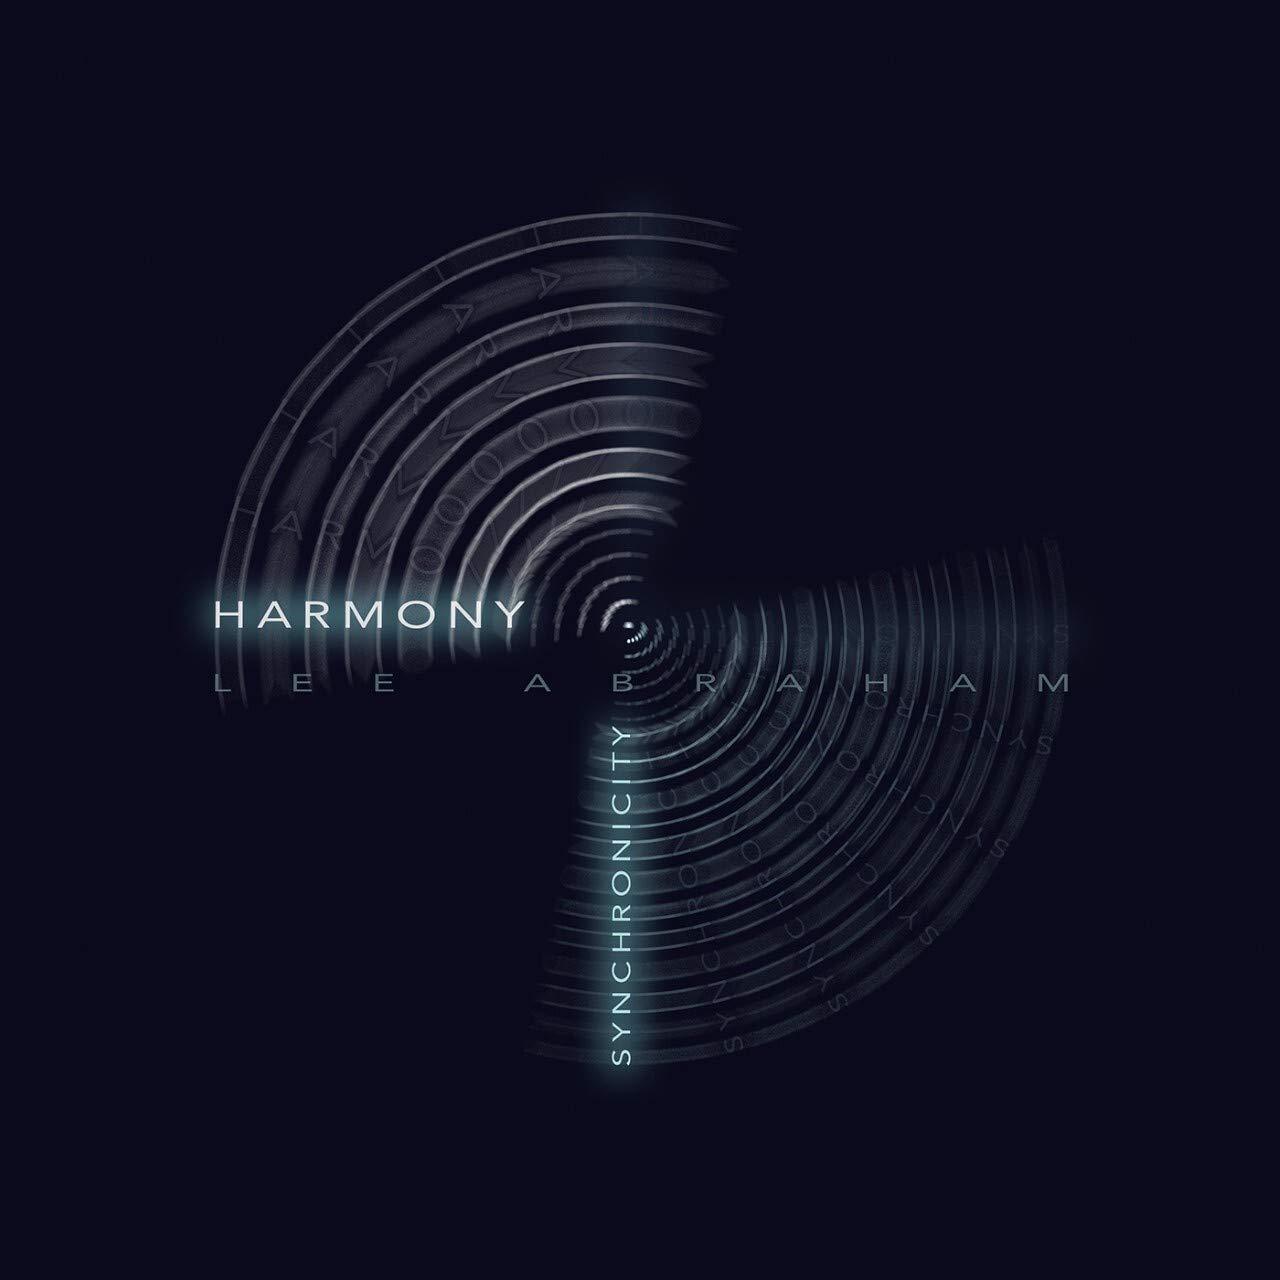 Lee Abraham - Harmony / Synchronicity (F2/JFK, 4.9.20)